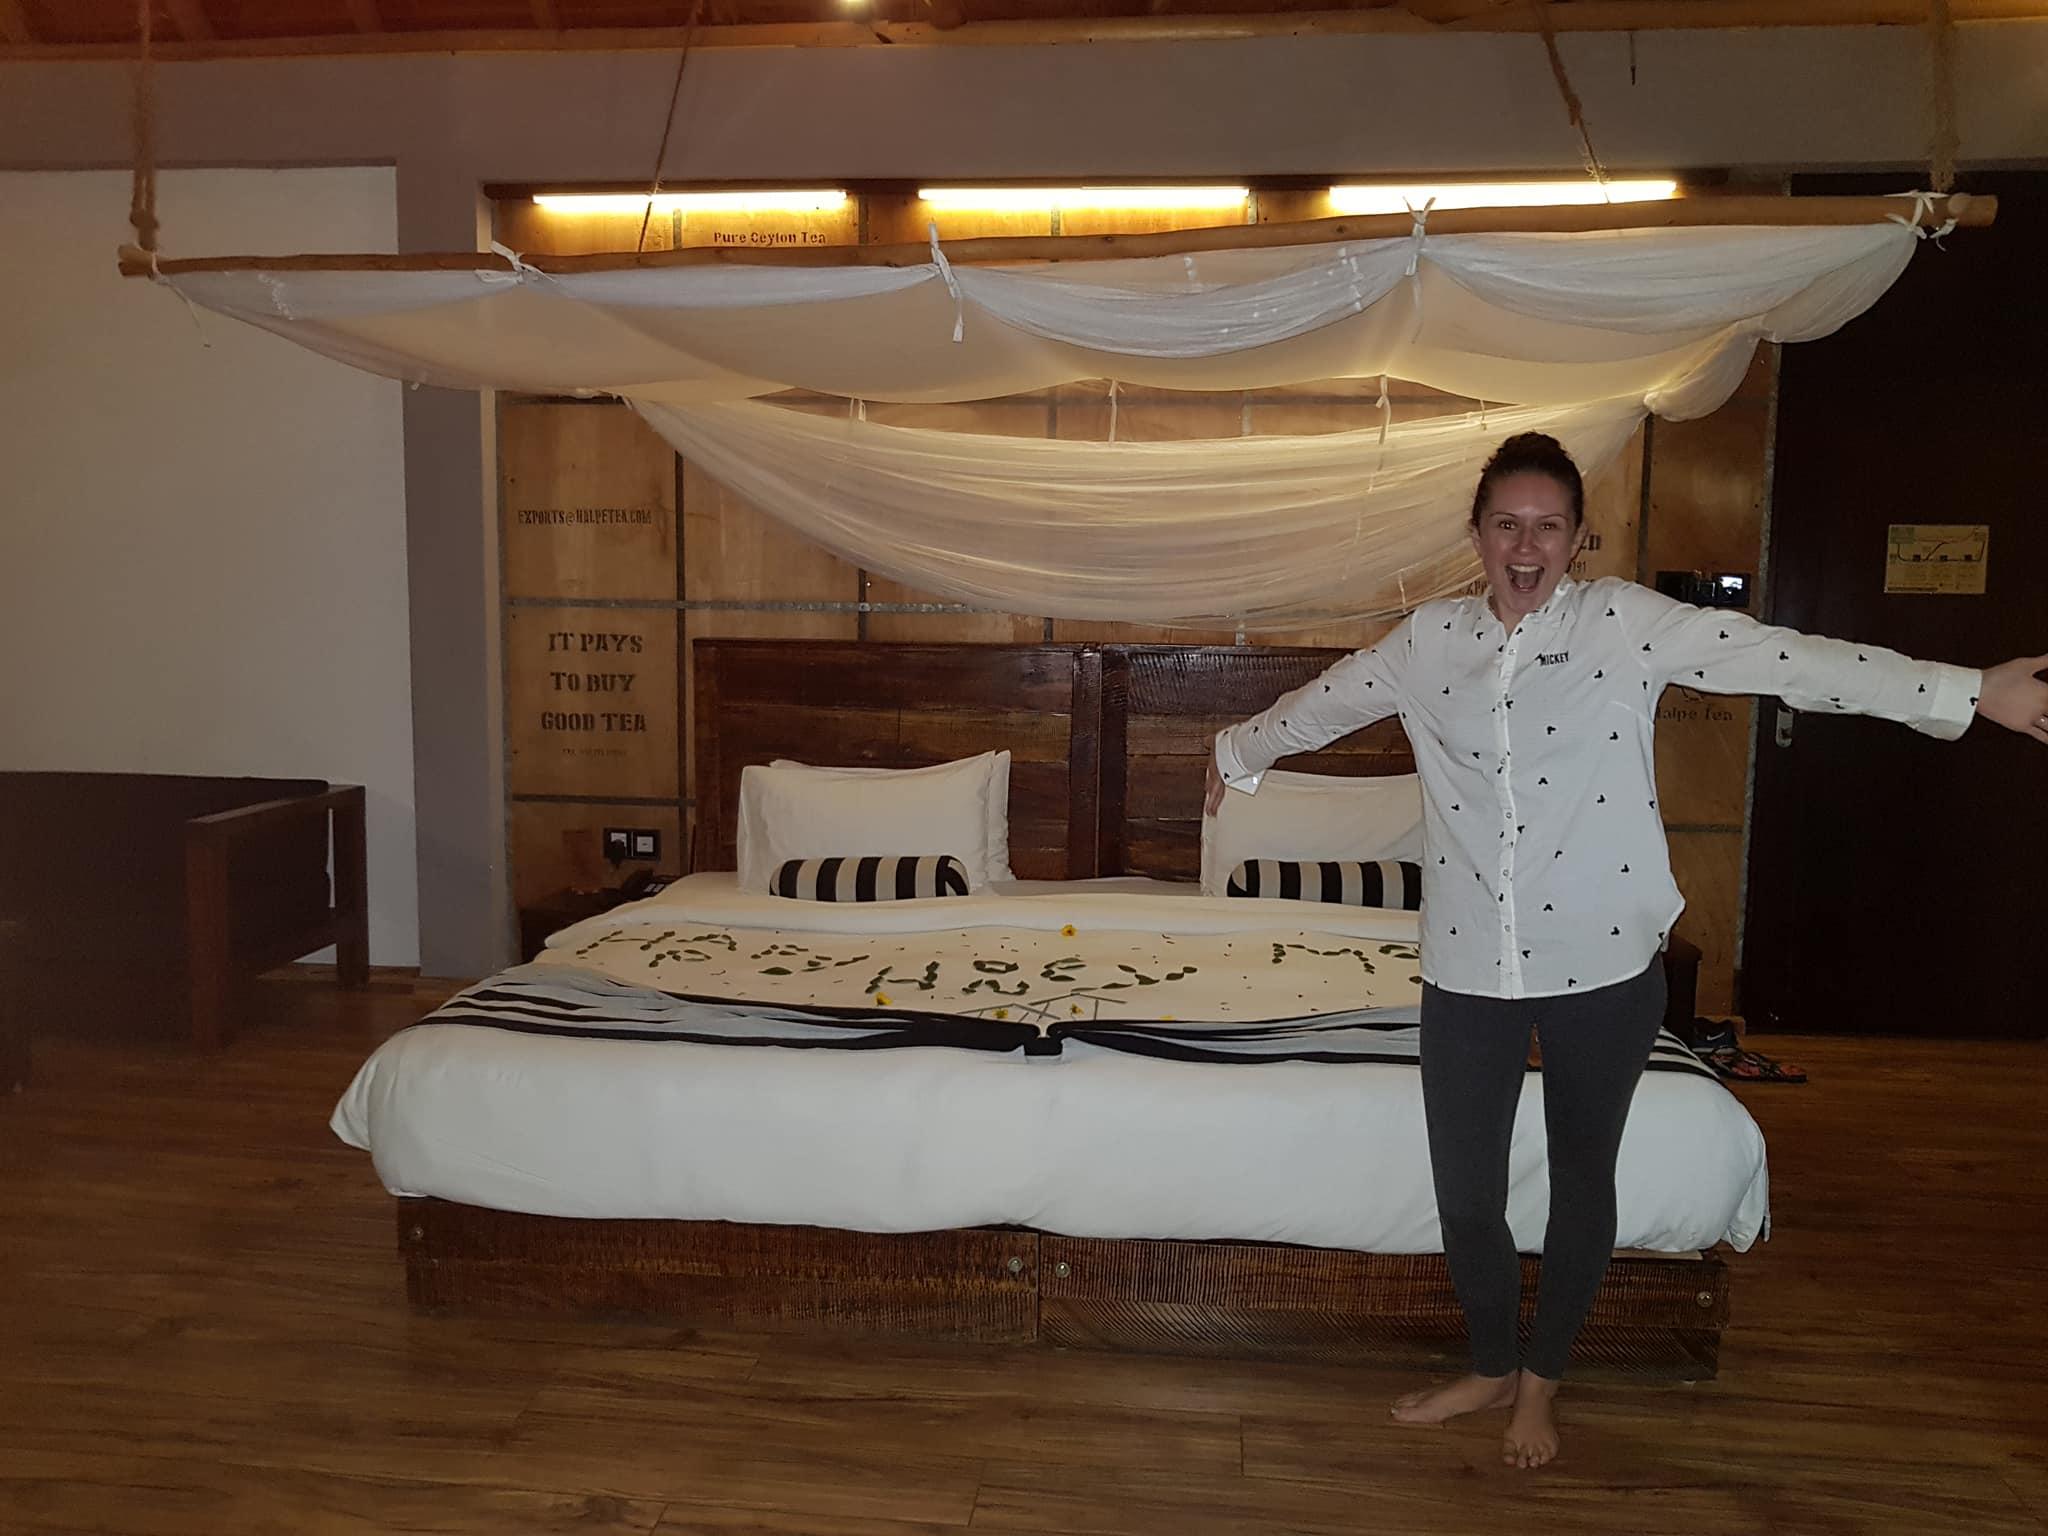 invite-to-paradise-sri-lanka-maldives-holiday-honeymoon-specialists-customer-guest-feedback-zane-lisa-butcher-98-acres-tea-plantation-ella-room-bed.jpg